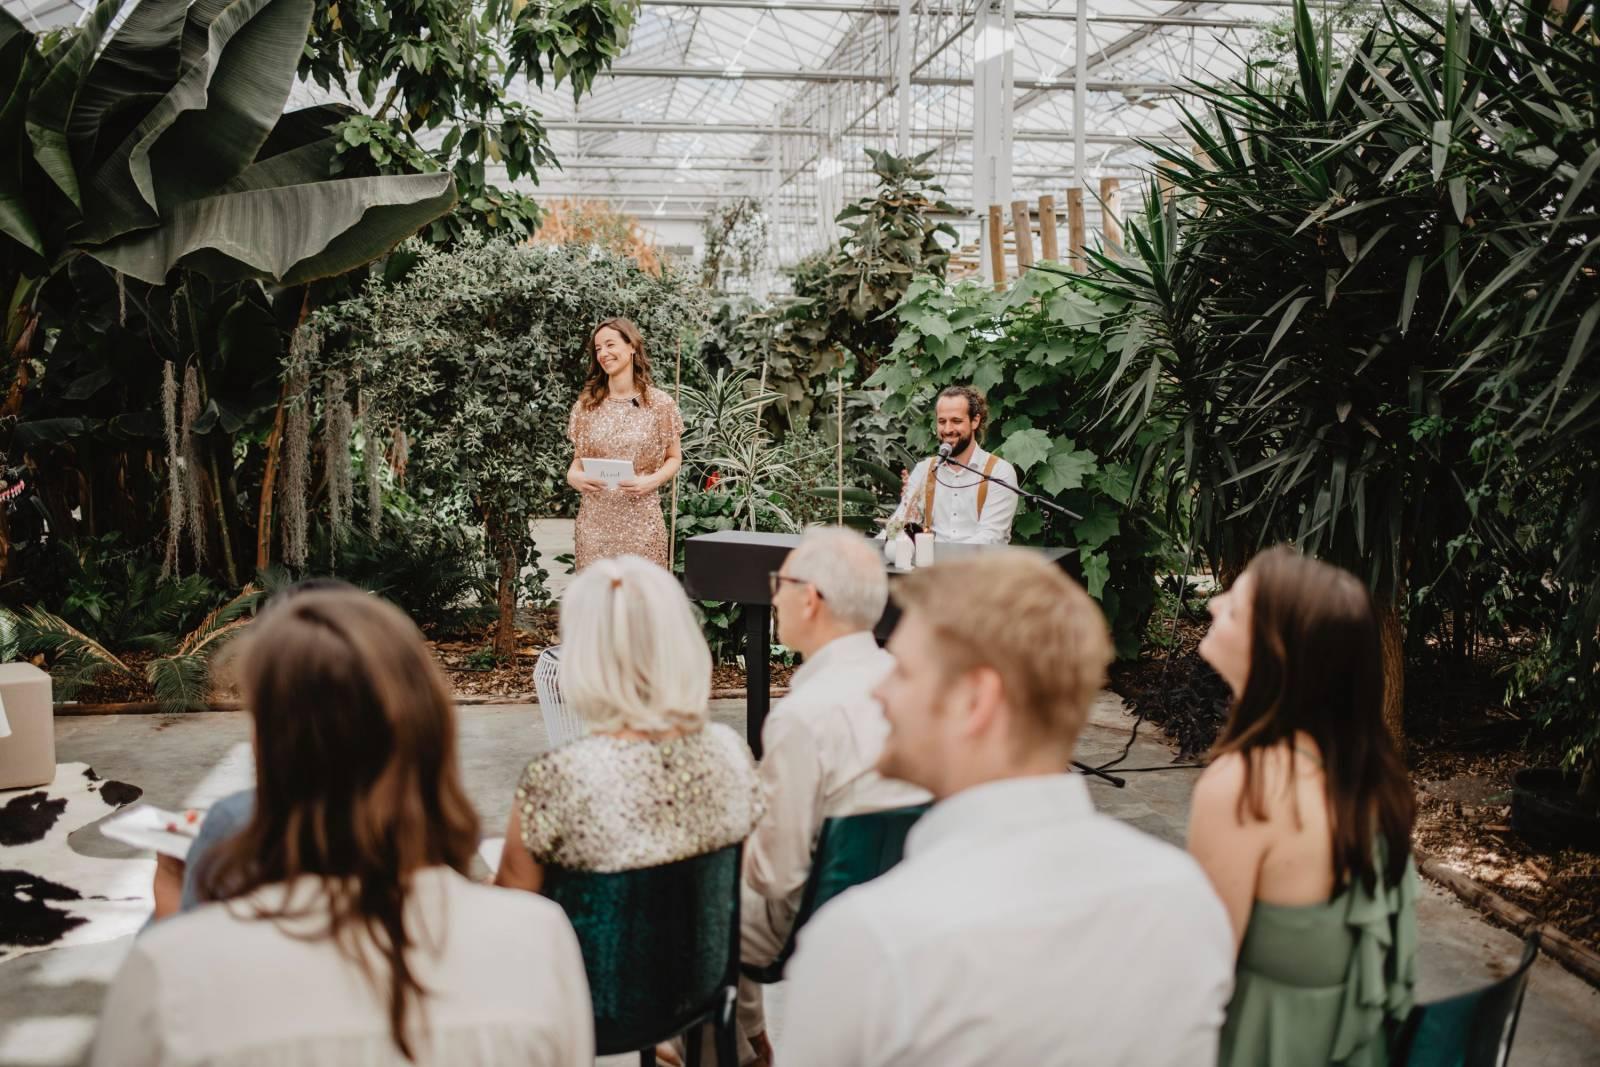 Merveil - Ceremoniespreker - IrmyPhotography - House of Weddings - 11